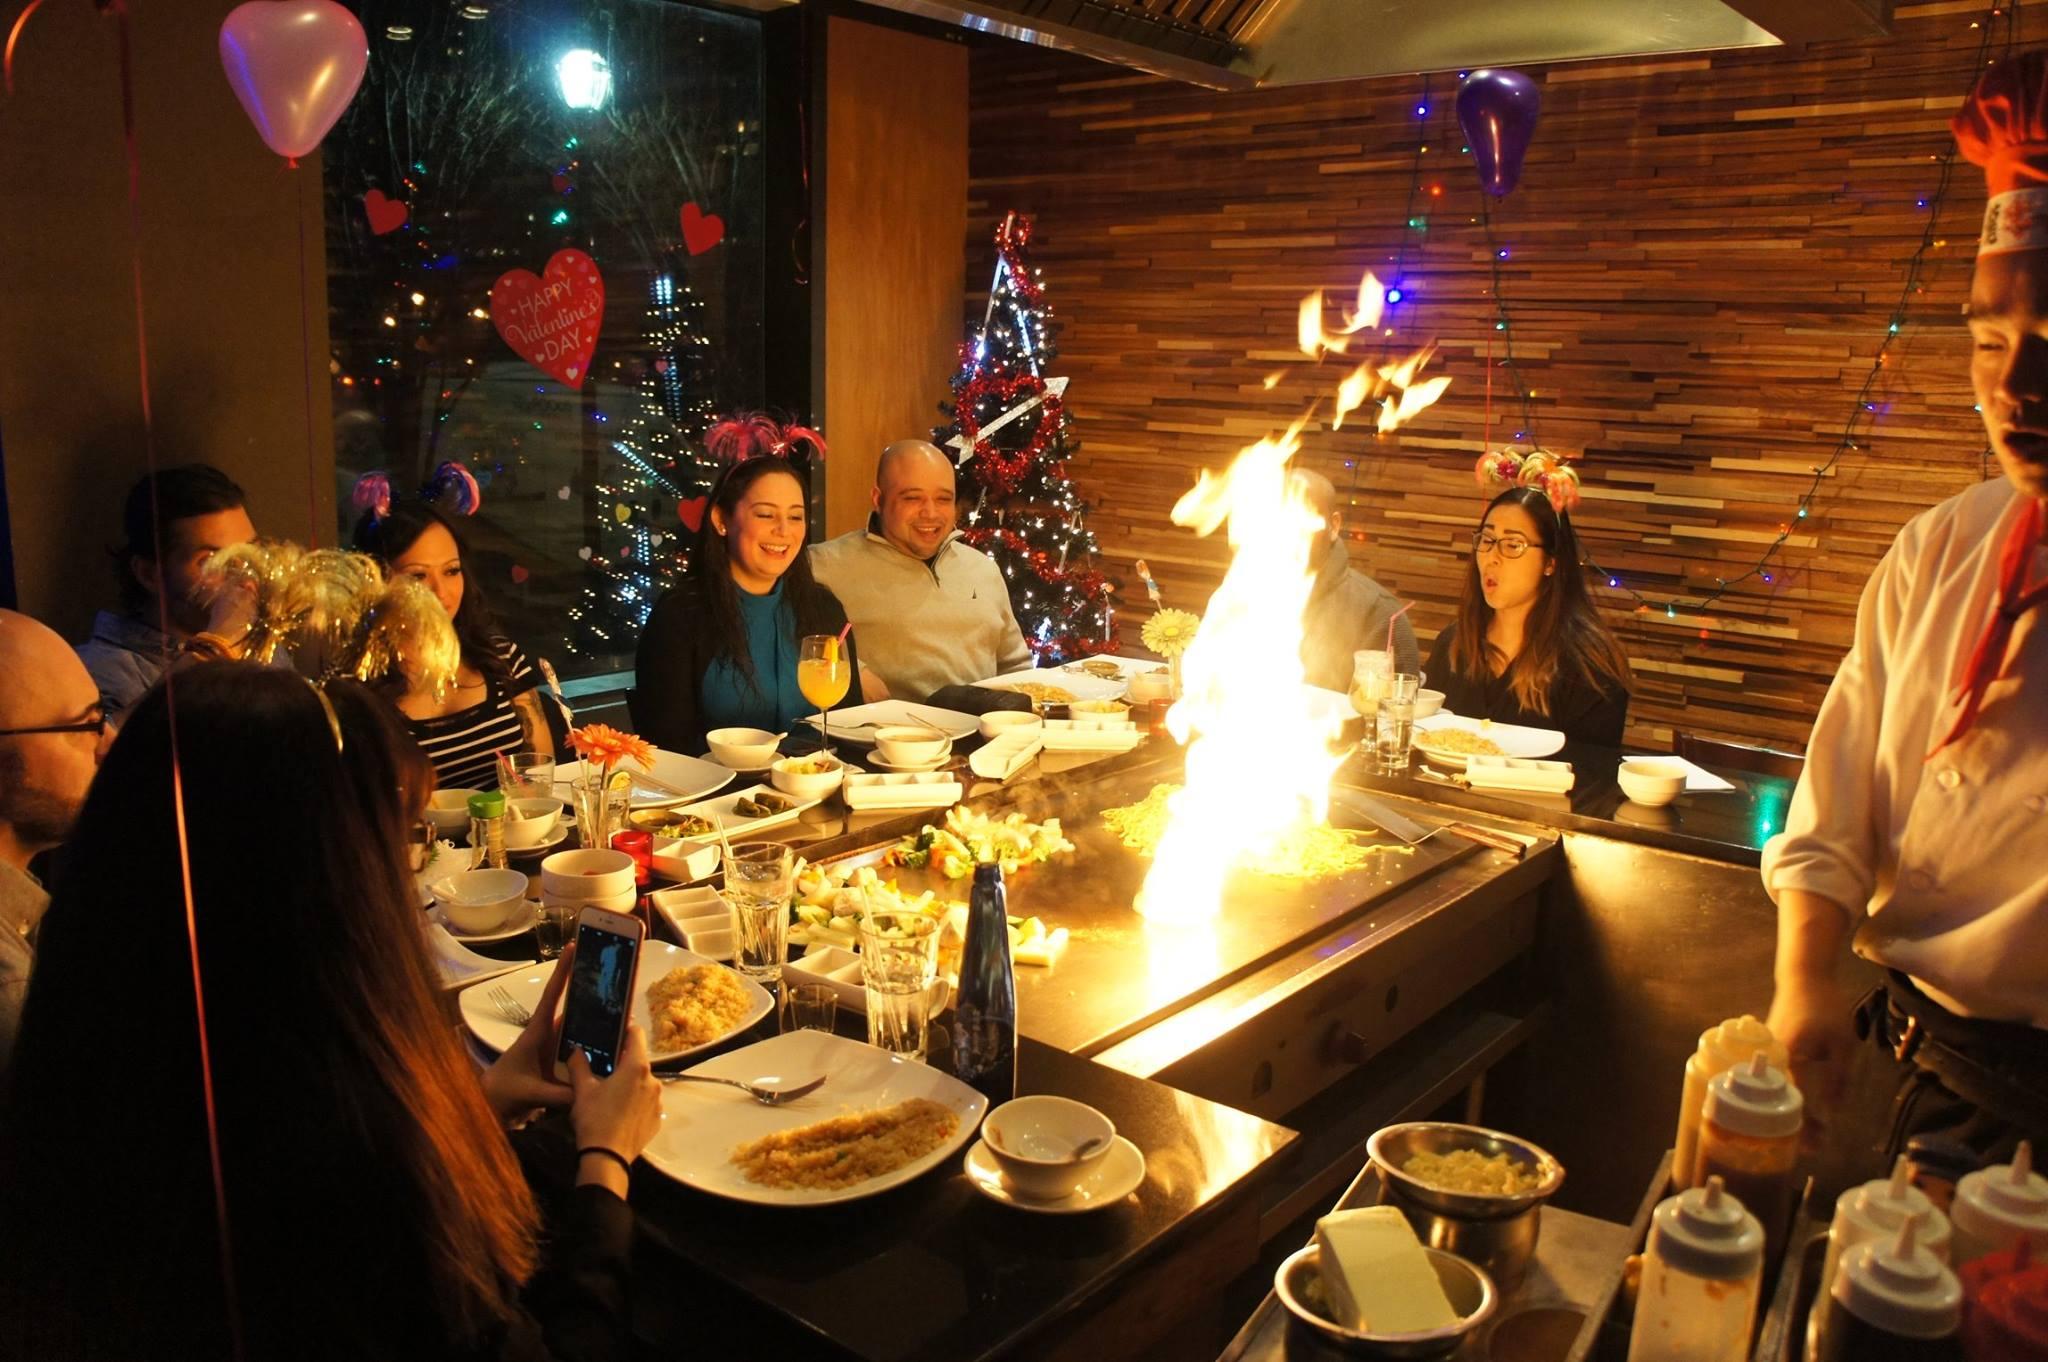 Hibachi near me, Hibachi restaurant near me, Hibachi grill near me, best Hibachi Grill near me